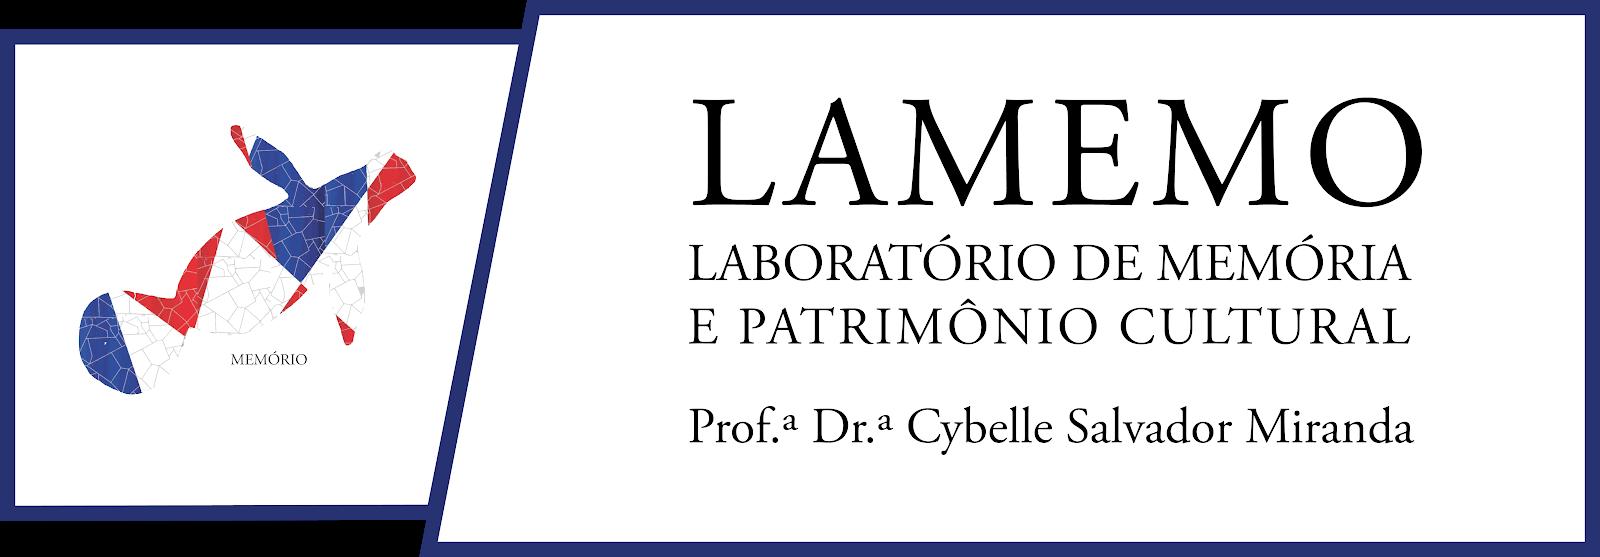 Memória e Patrimônio  |  LAMEMO-UFPA